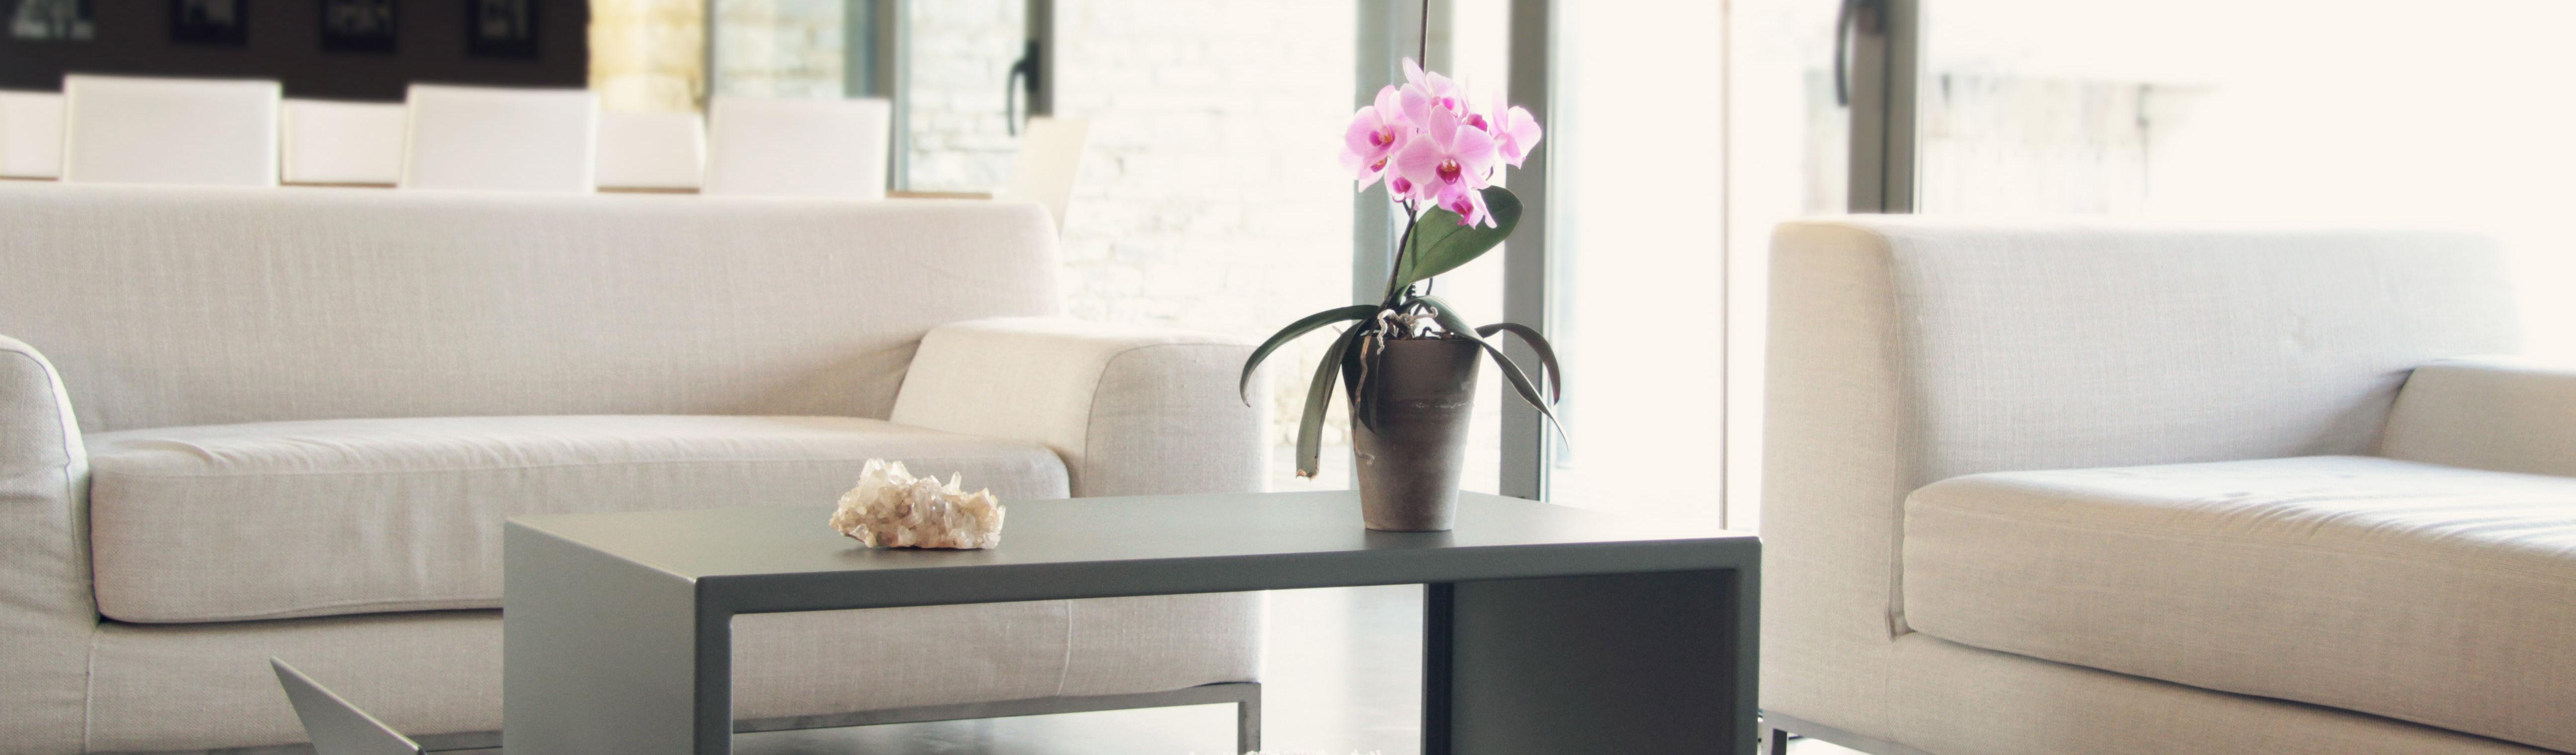 mon entr e muebles y accesorios en paris homify. Black Bedroom Furniture Sets. Home Design Ideas